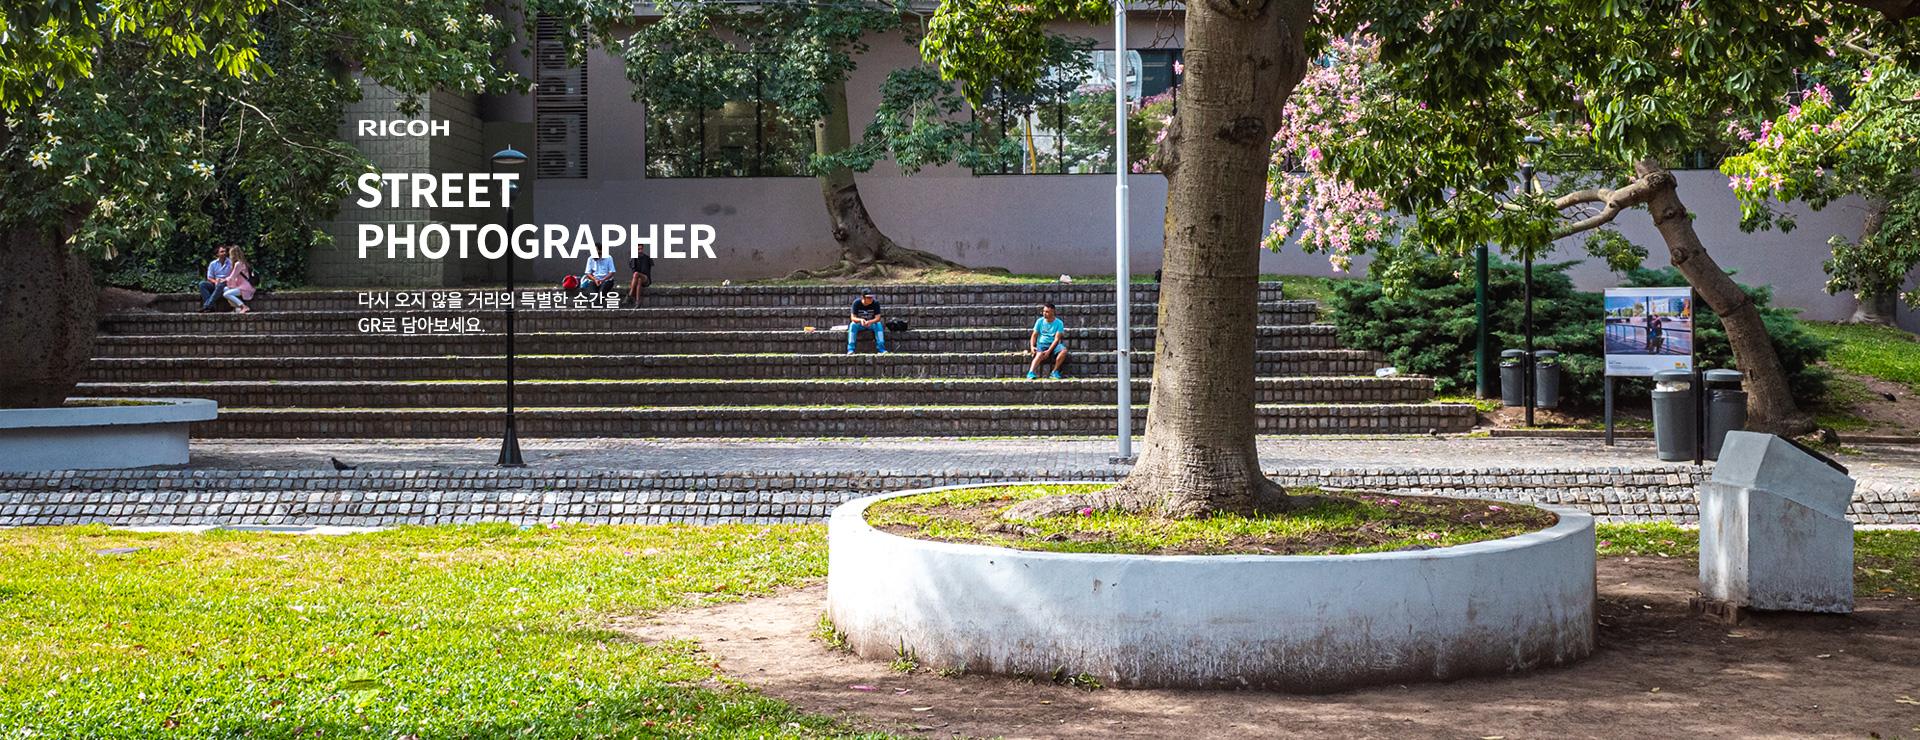 Street Photographer GR